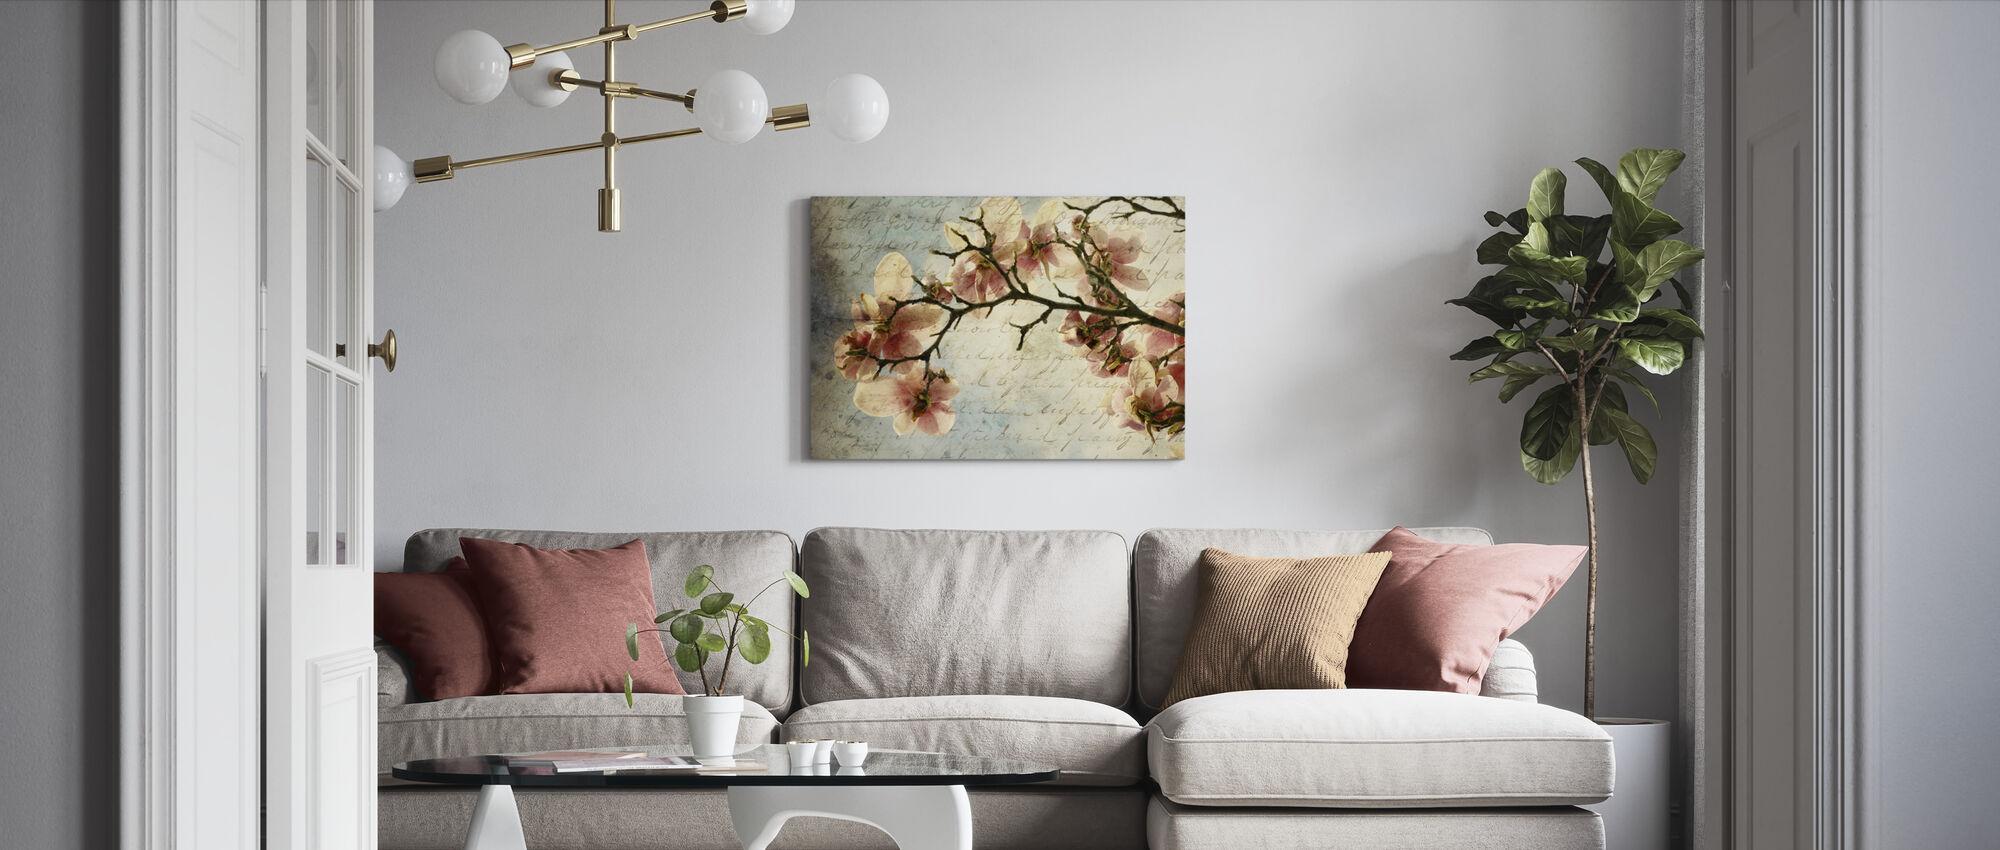 Magnolia Memories - Canvas print - Living Room